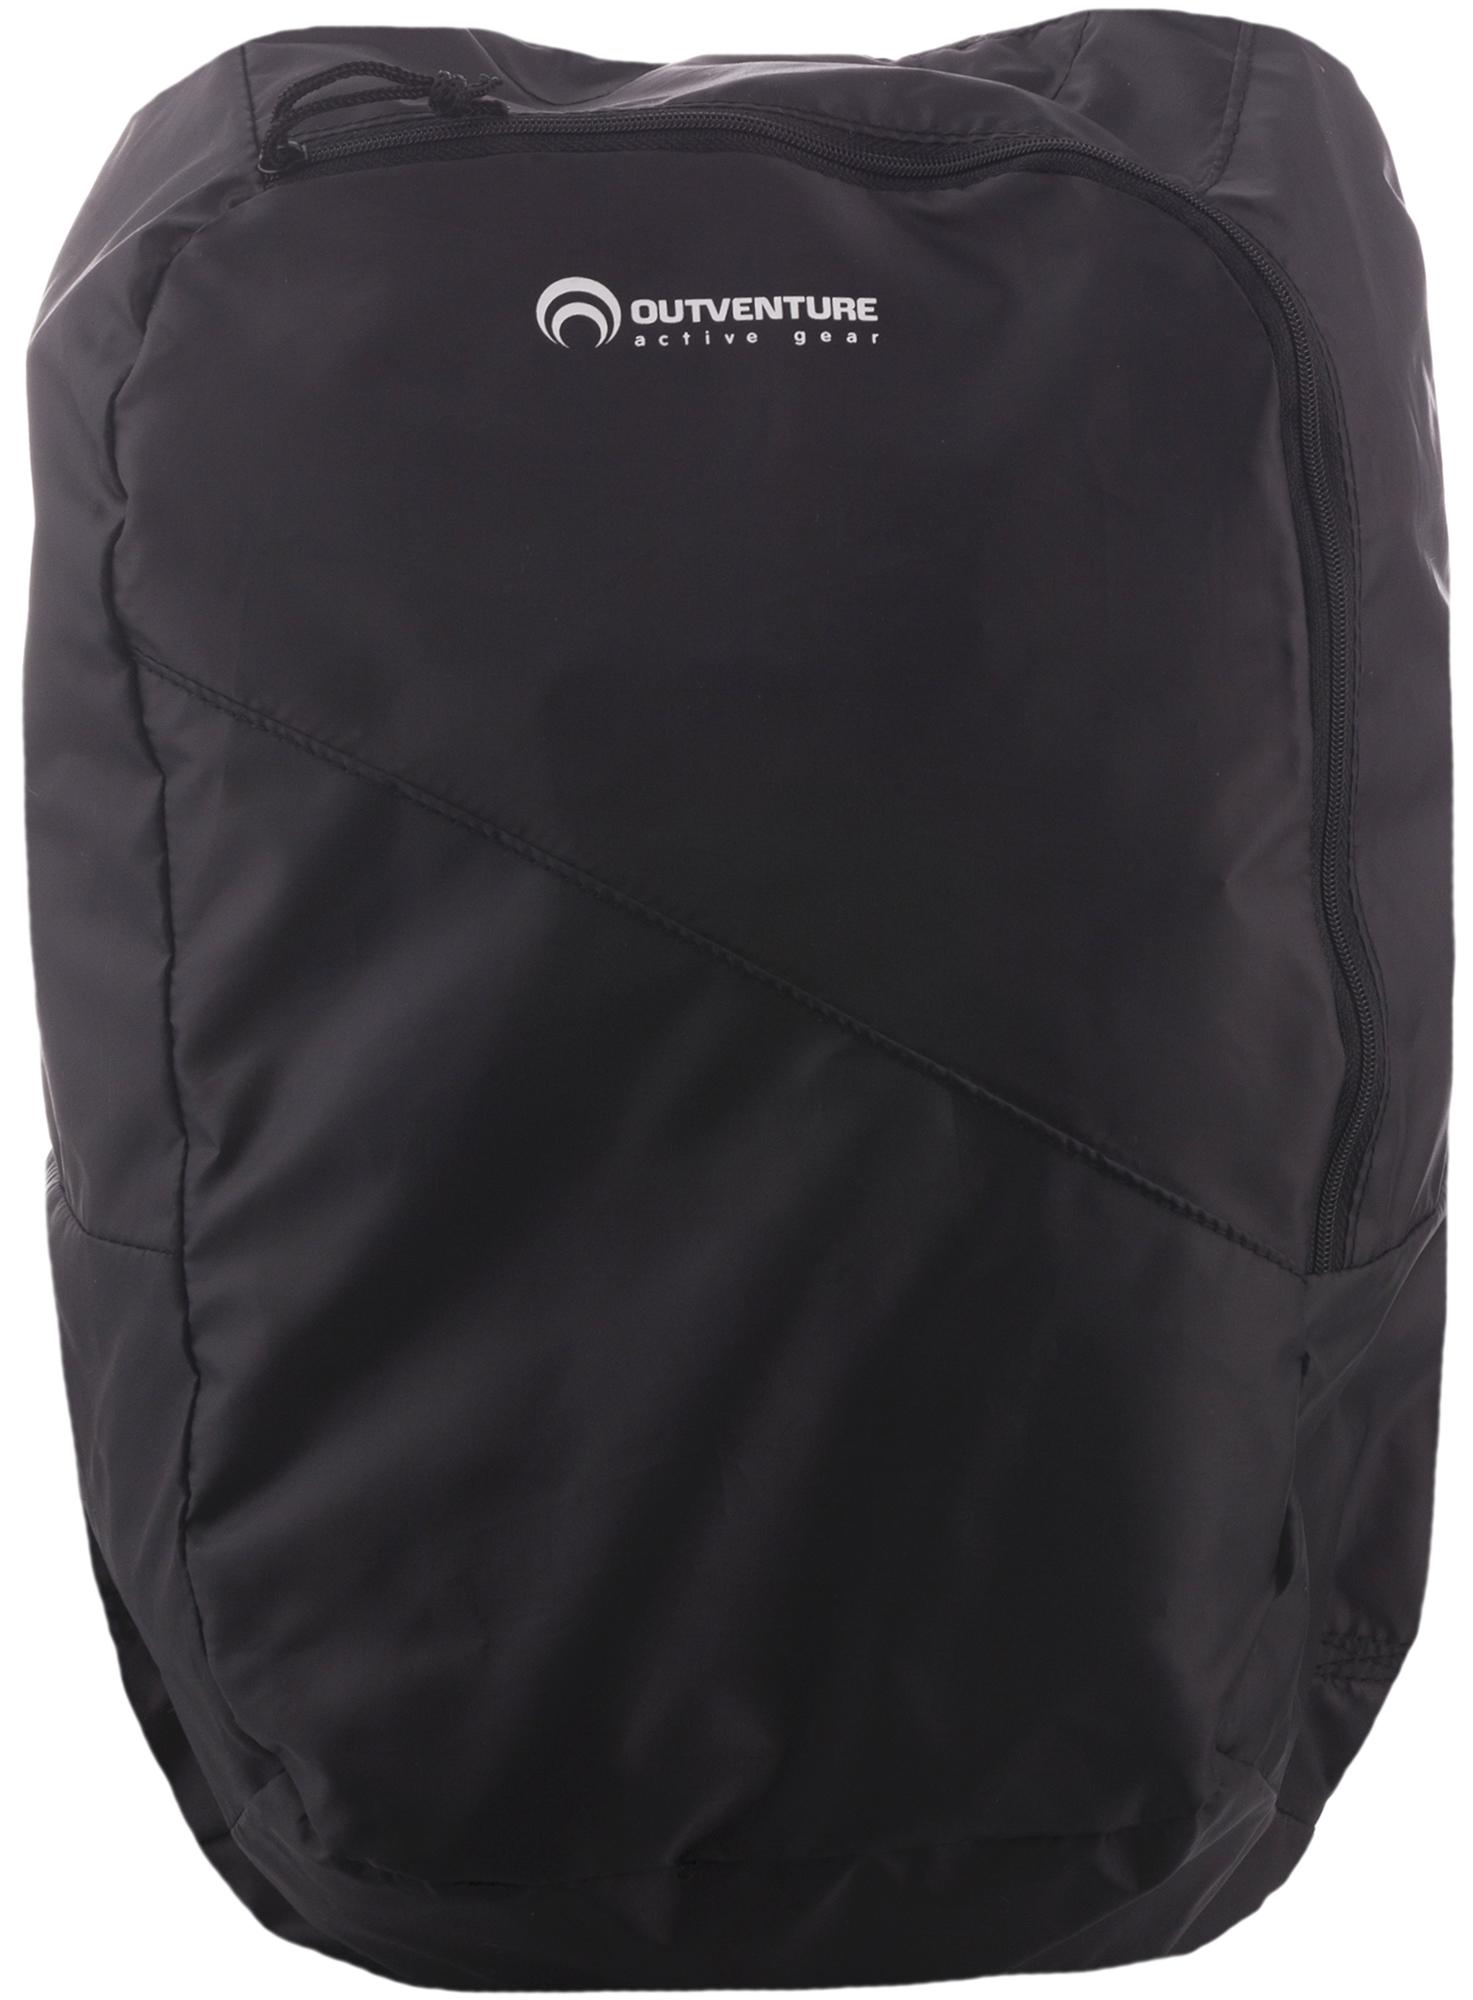 Outventure Folding backpack 14 рюкзак пикниковый outventure picnic backpack с аксессуарами на 3 персоны